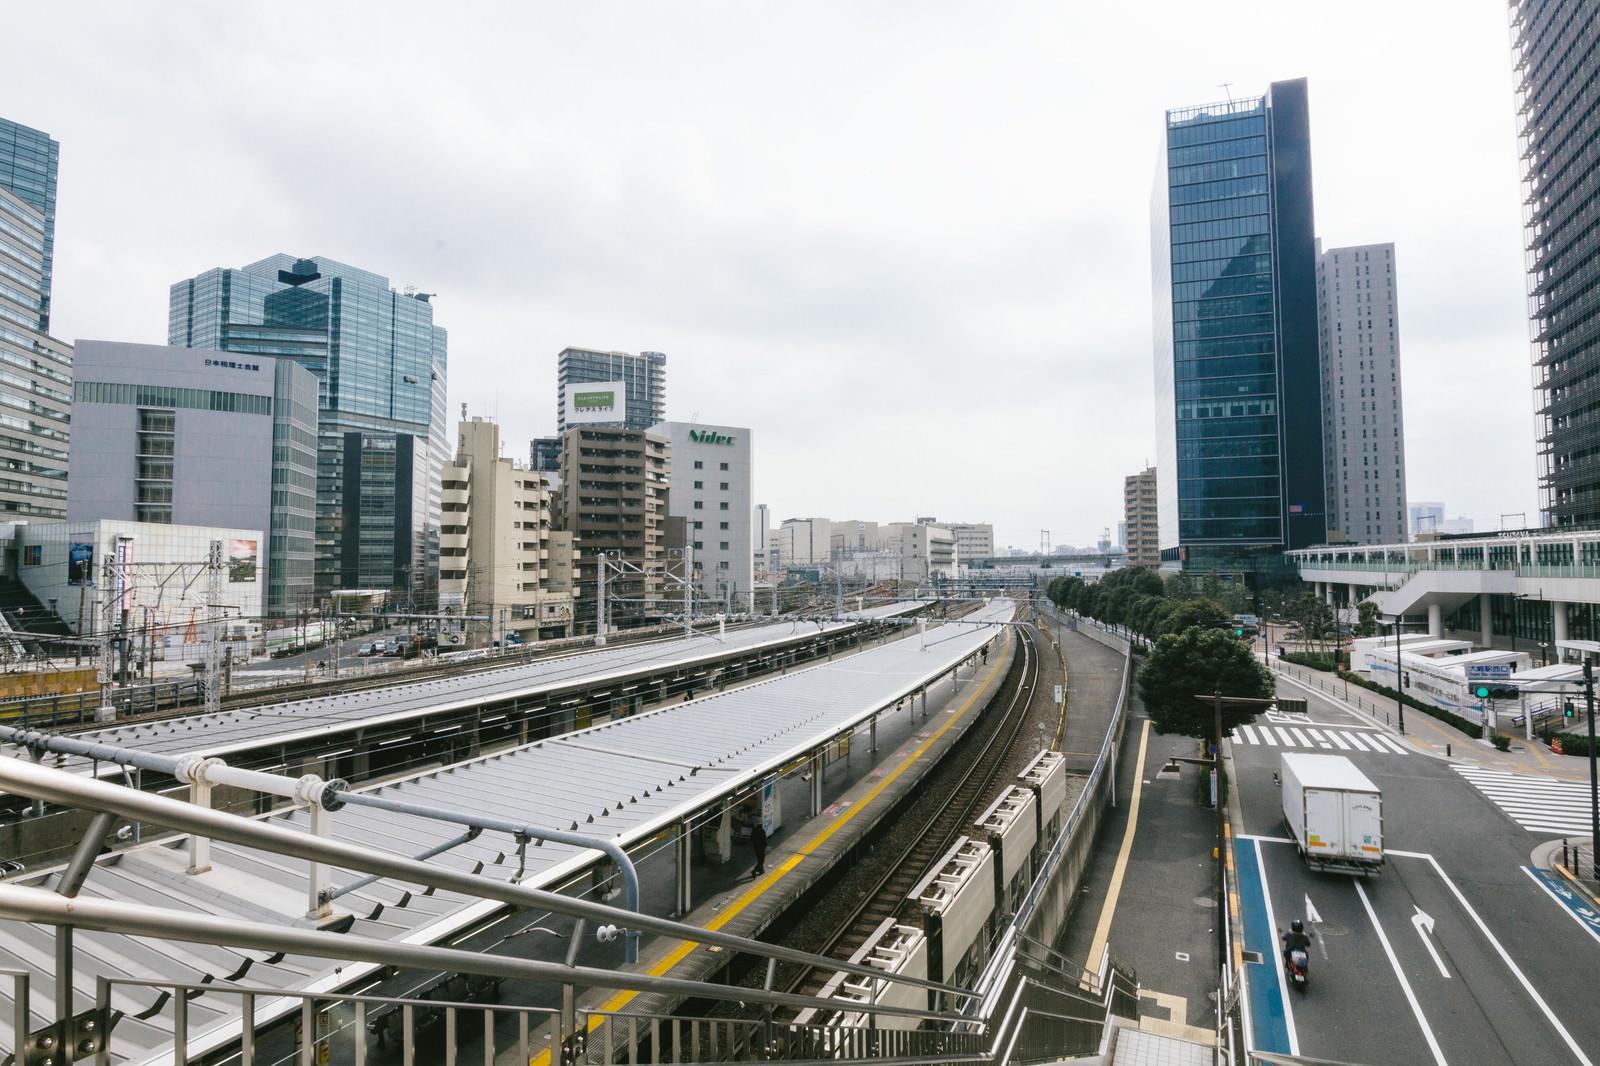 「大崎駅周辺の様子」の写真